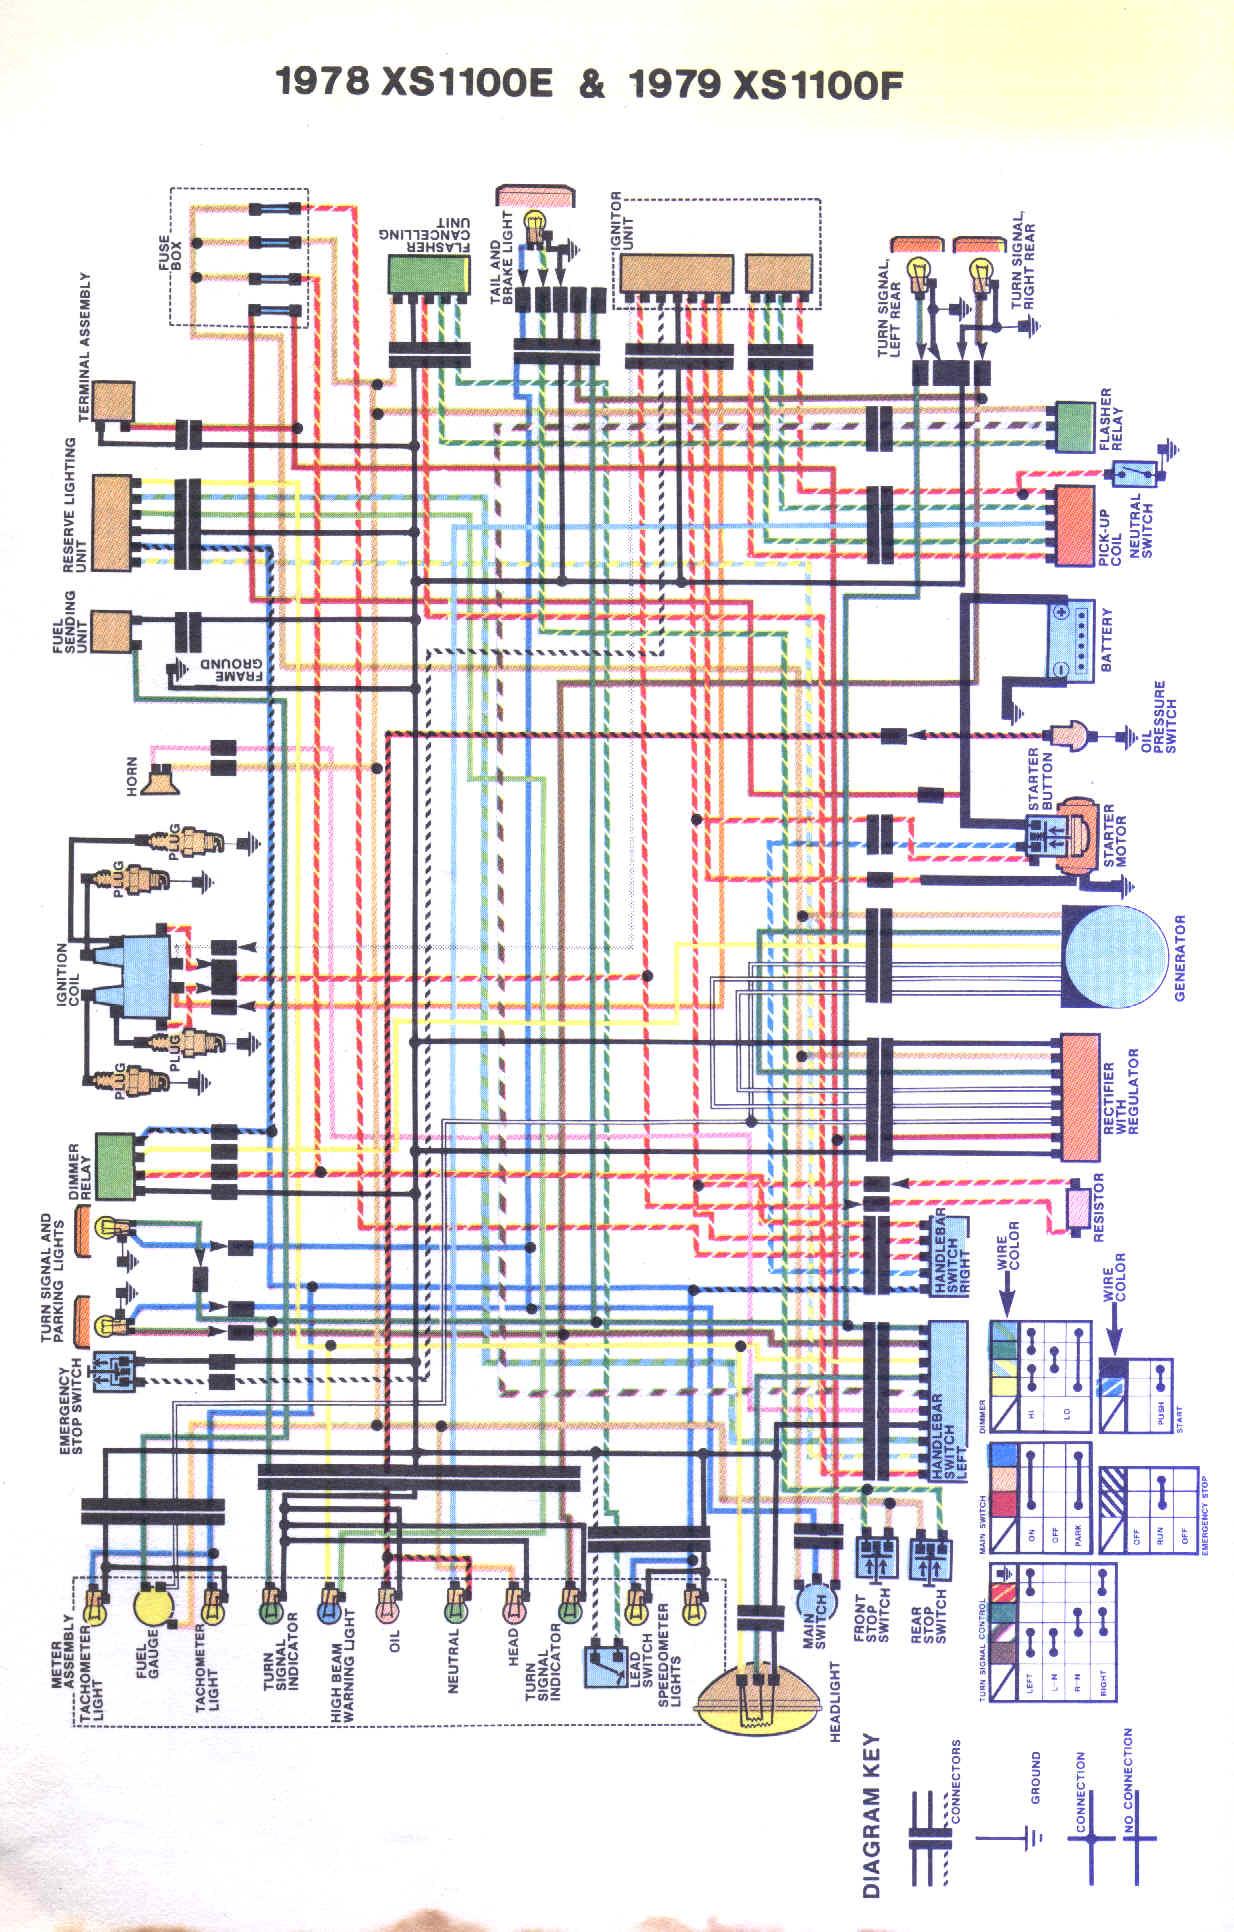 1980 Trans Am Headlight Wiring Diagram - 1998 Isuzu Wizard Fuse Box Diagram  - 7gen-nissaan.tukune.jeanjaures37.fr Wiring Diagram Resource